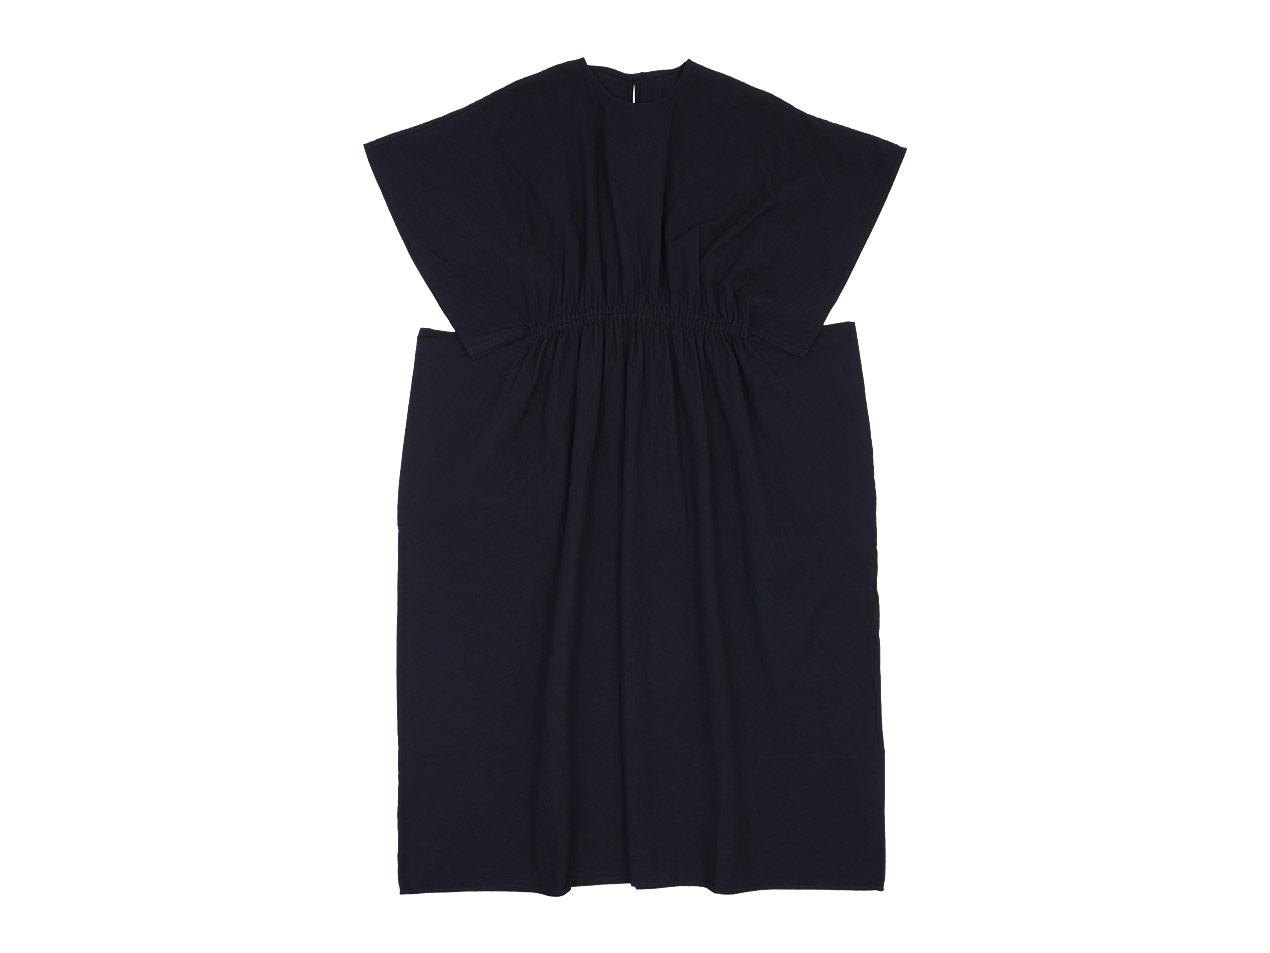 homspun 藍染 ワイドギャザー ロングワンピース / ギャザー ロングスカート